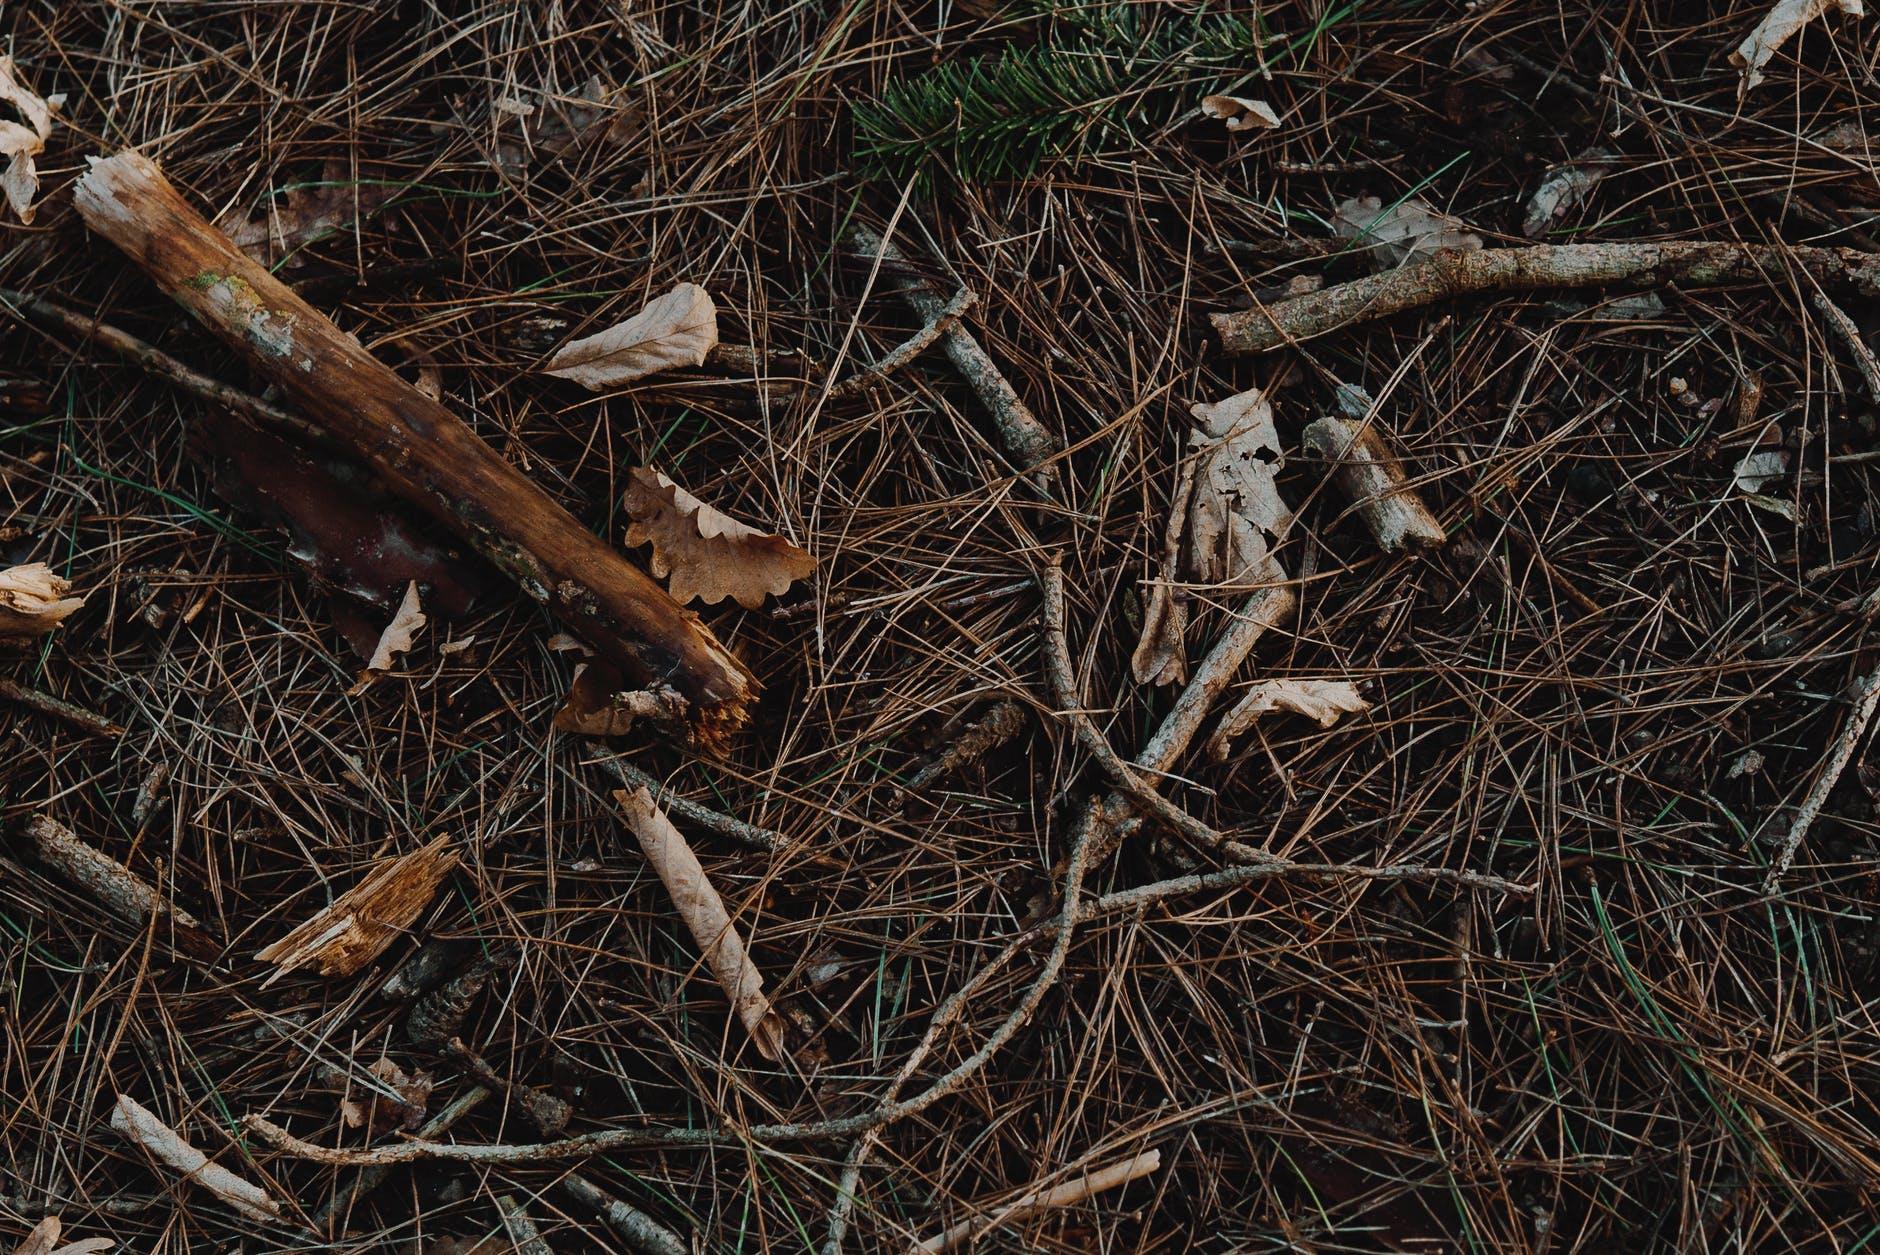 dry broken sticks